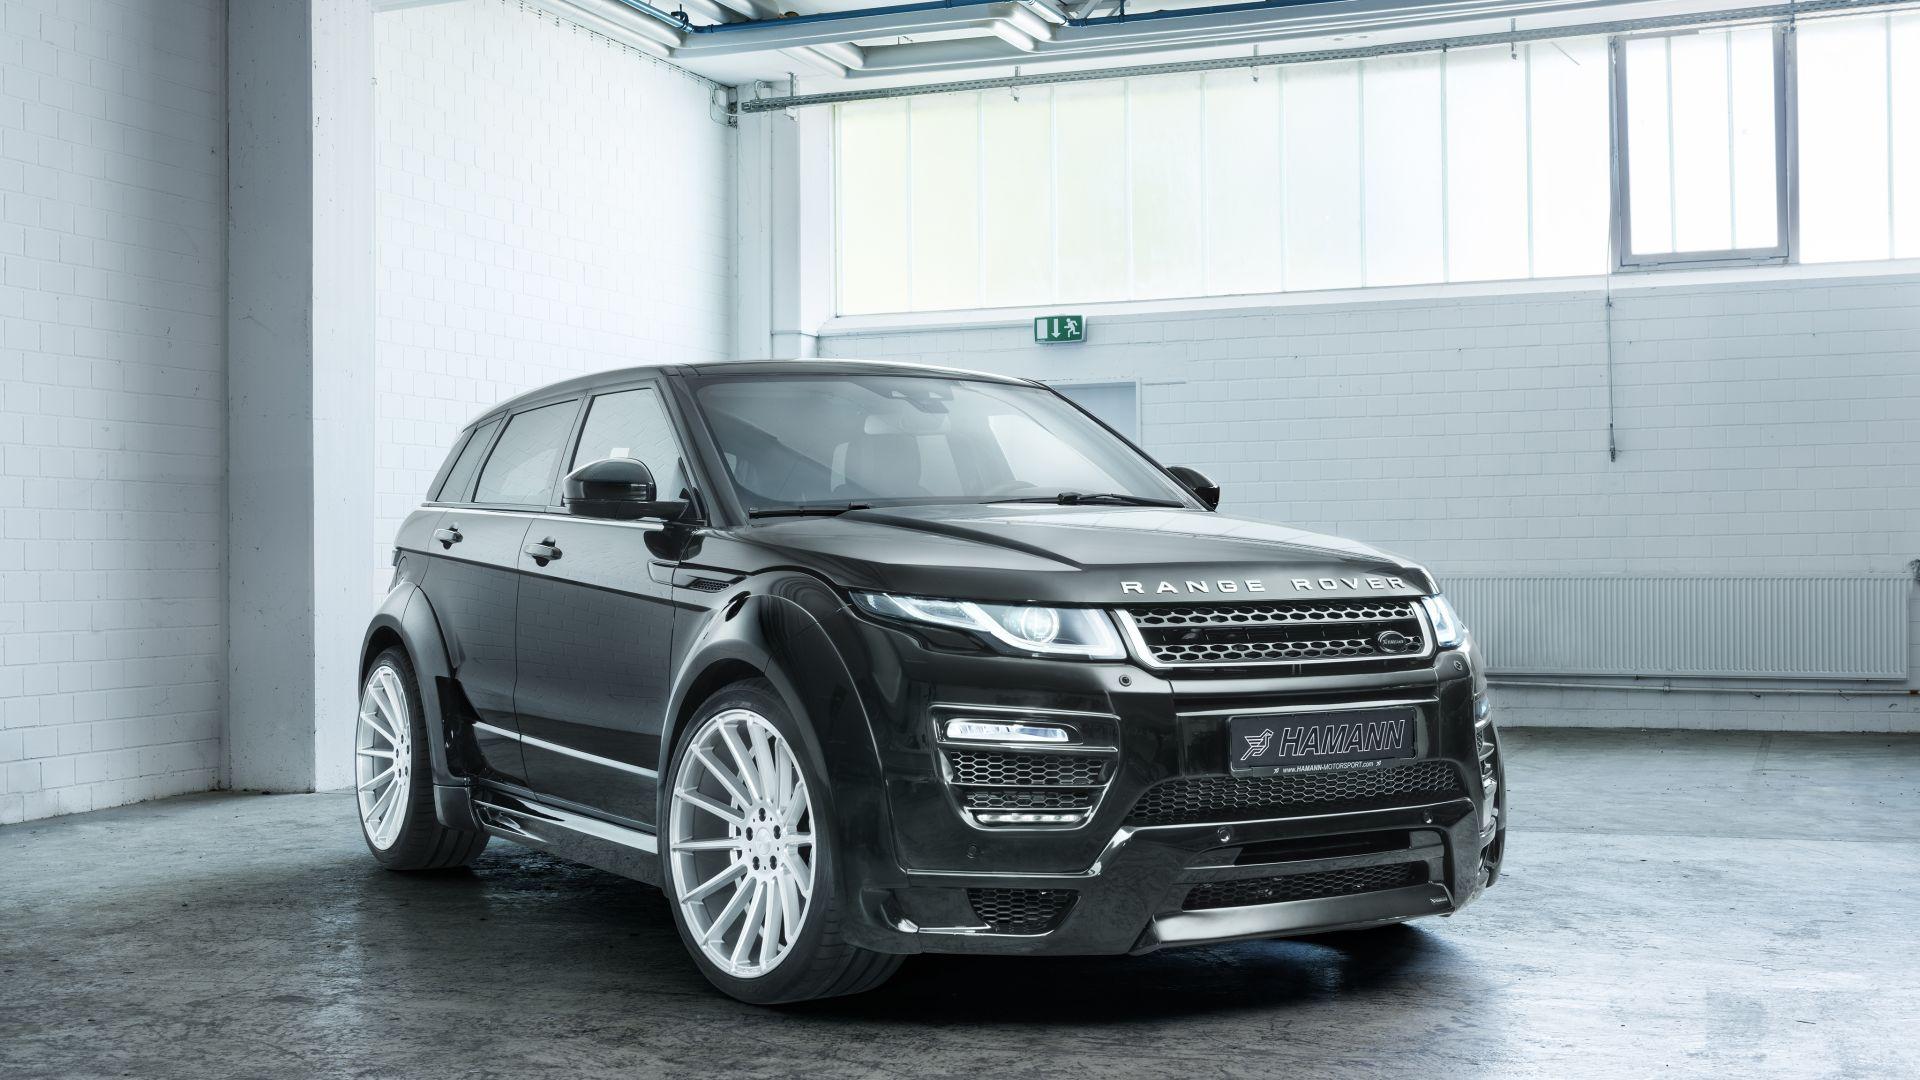 wallpaper range rover evoque hamann black cars bikes 11345. Black Bedroom Furniture Sets. Home Design Ideas